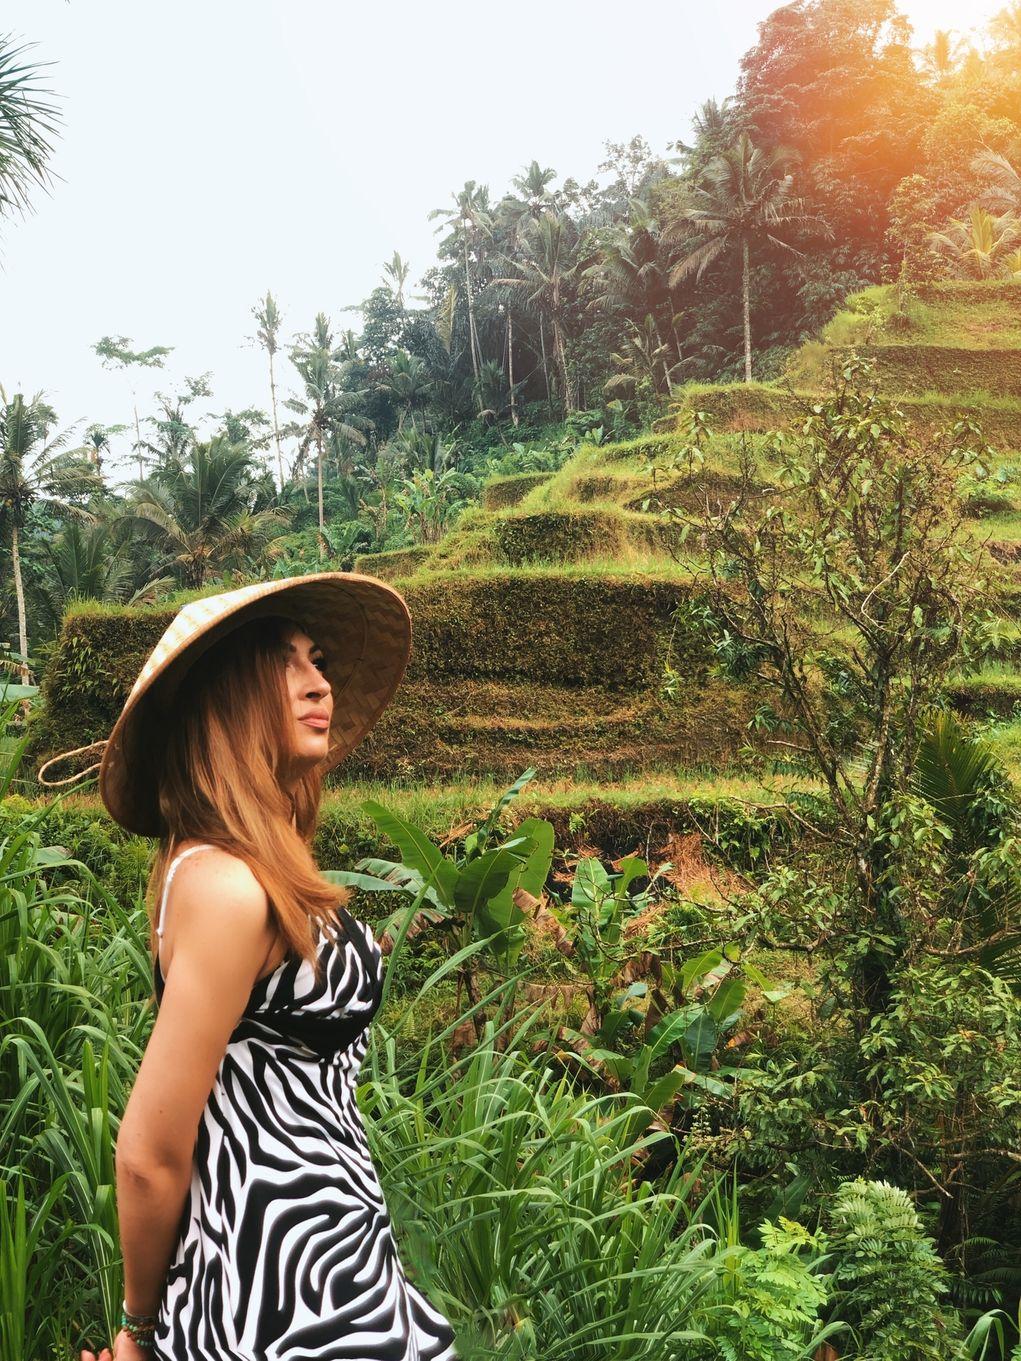 mytravelgram Bali Ubud indonesia travelstory travelphoto